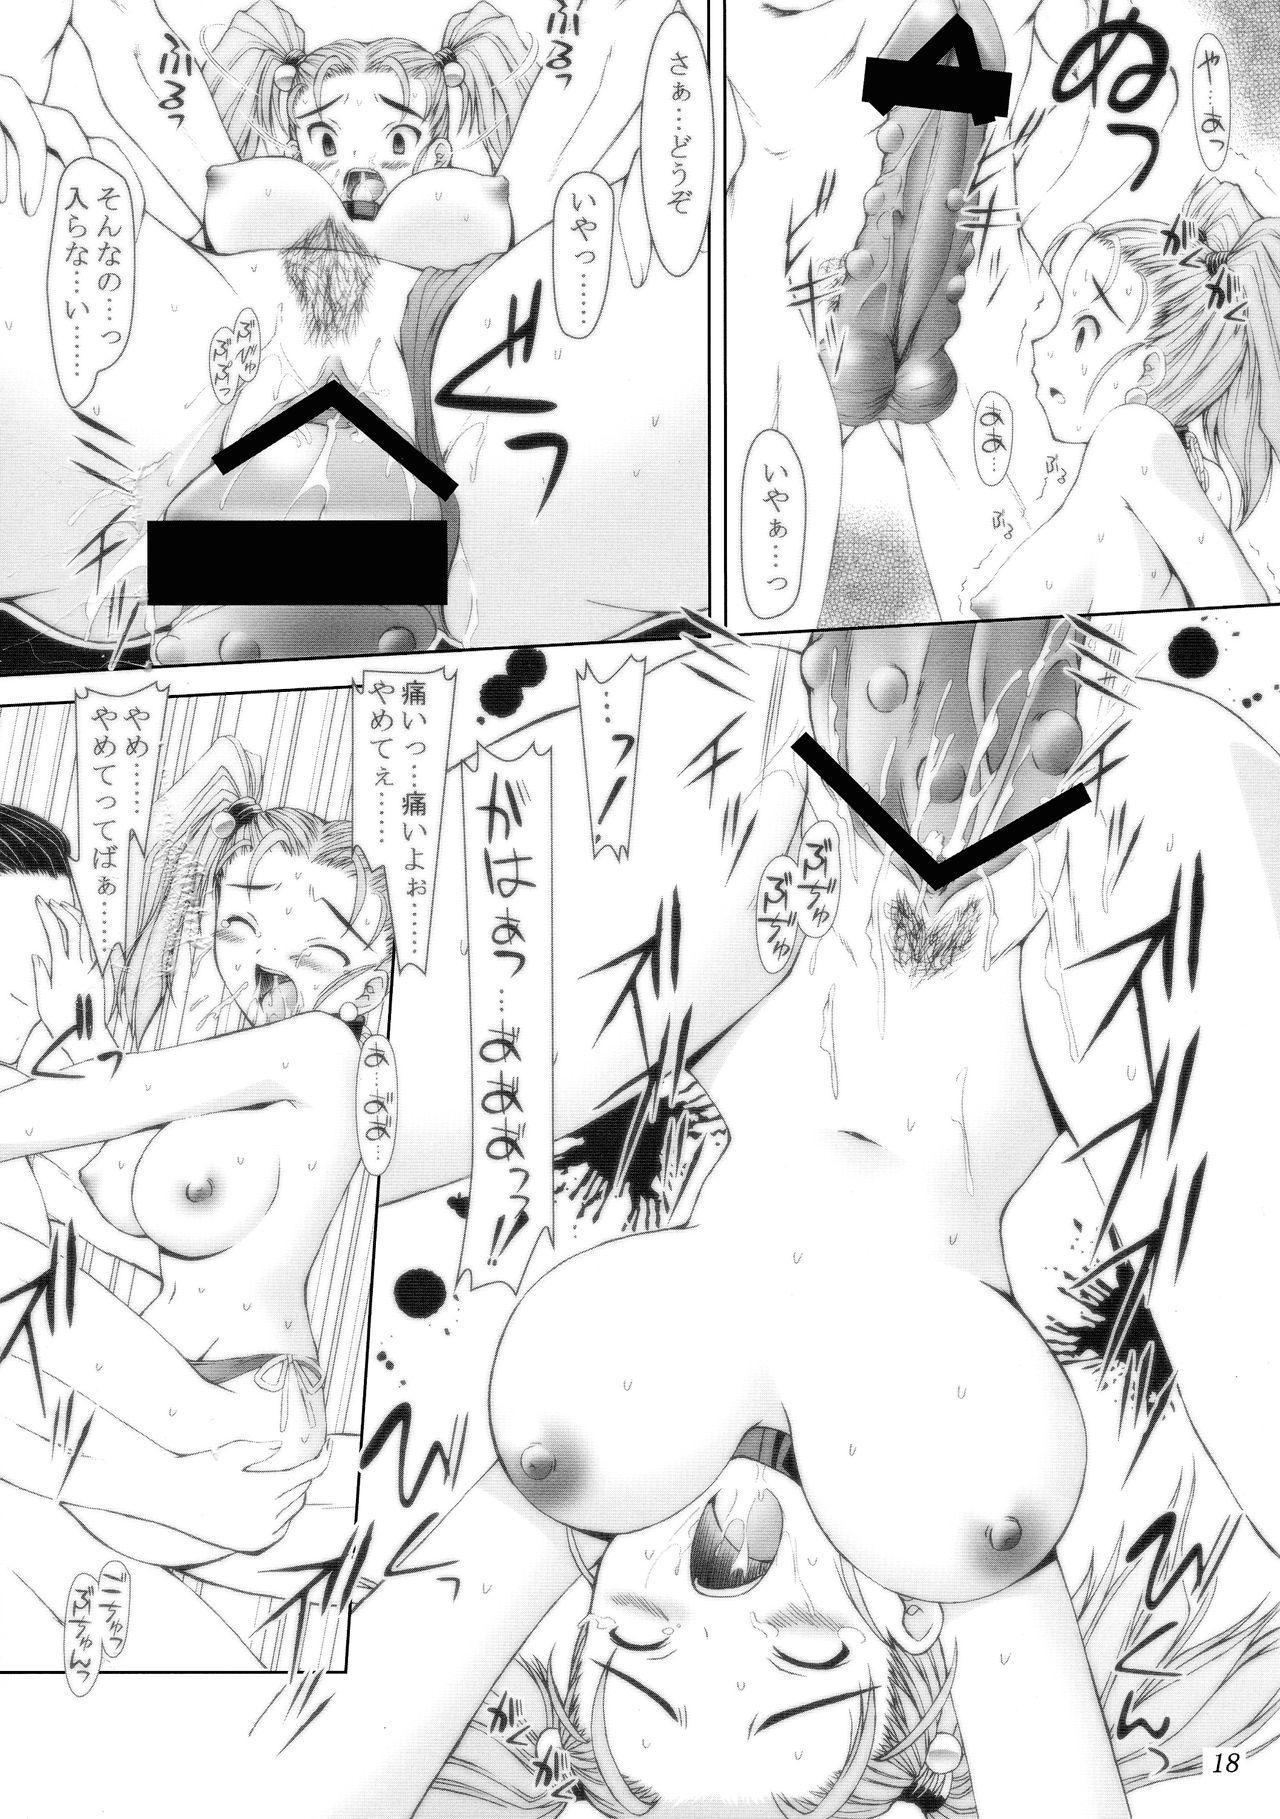 (C73) [ashitakara-ganbaru (Yameta Takashi)] ZIG-ZIG-ZIG 3 -2004~2005- (Various) 17